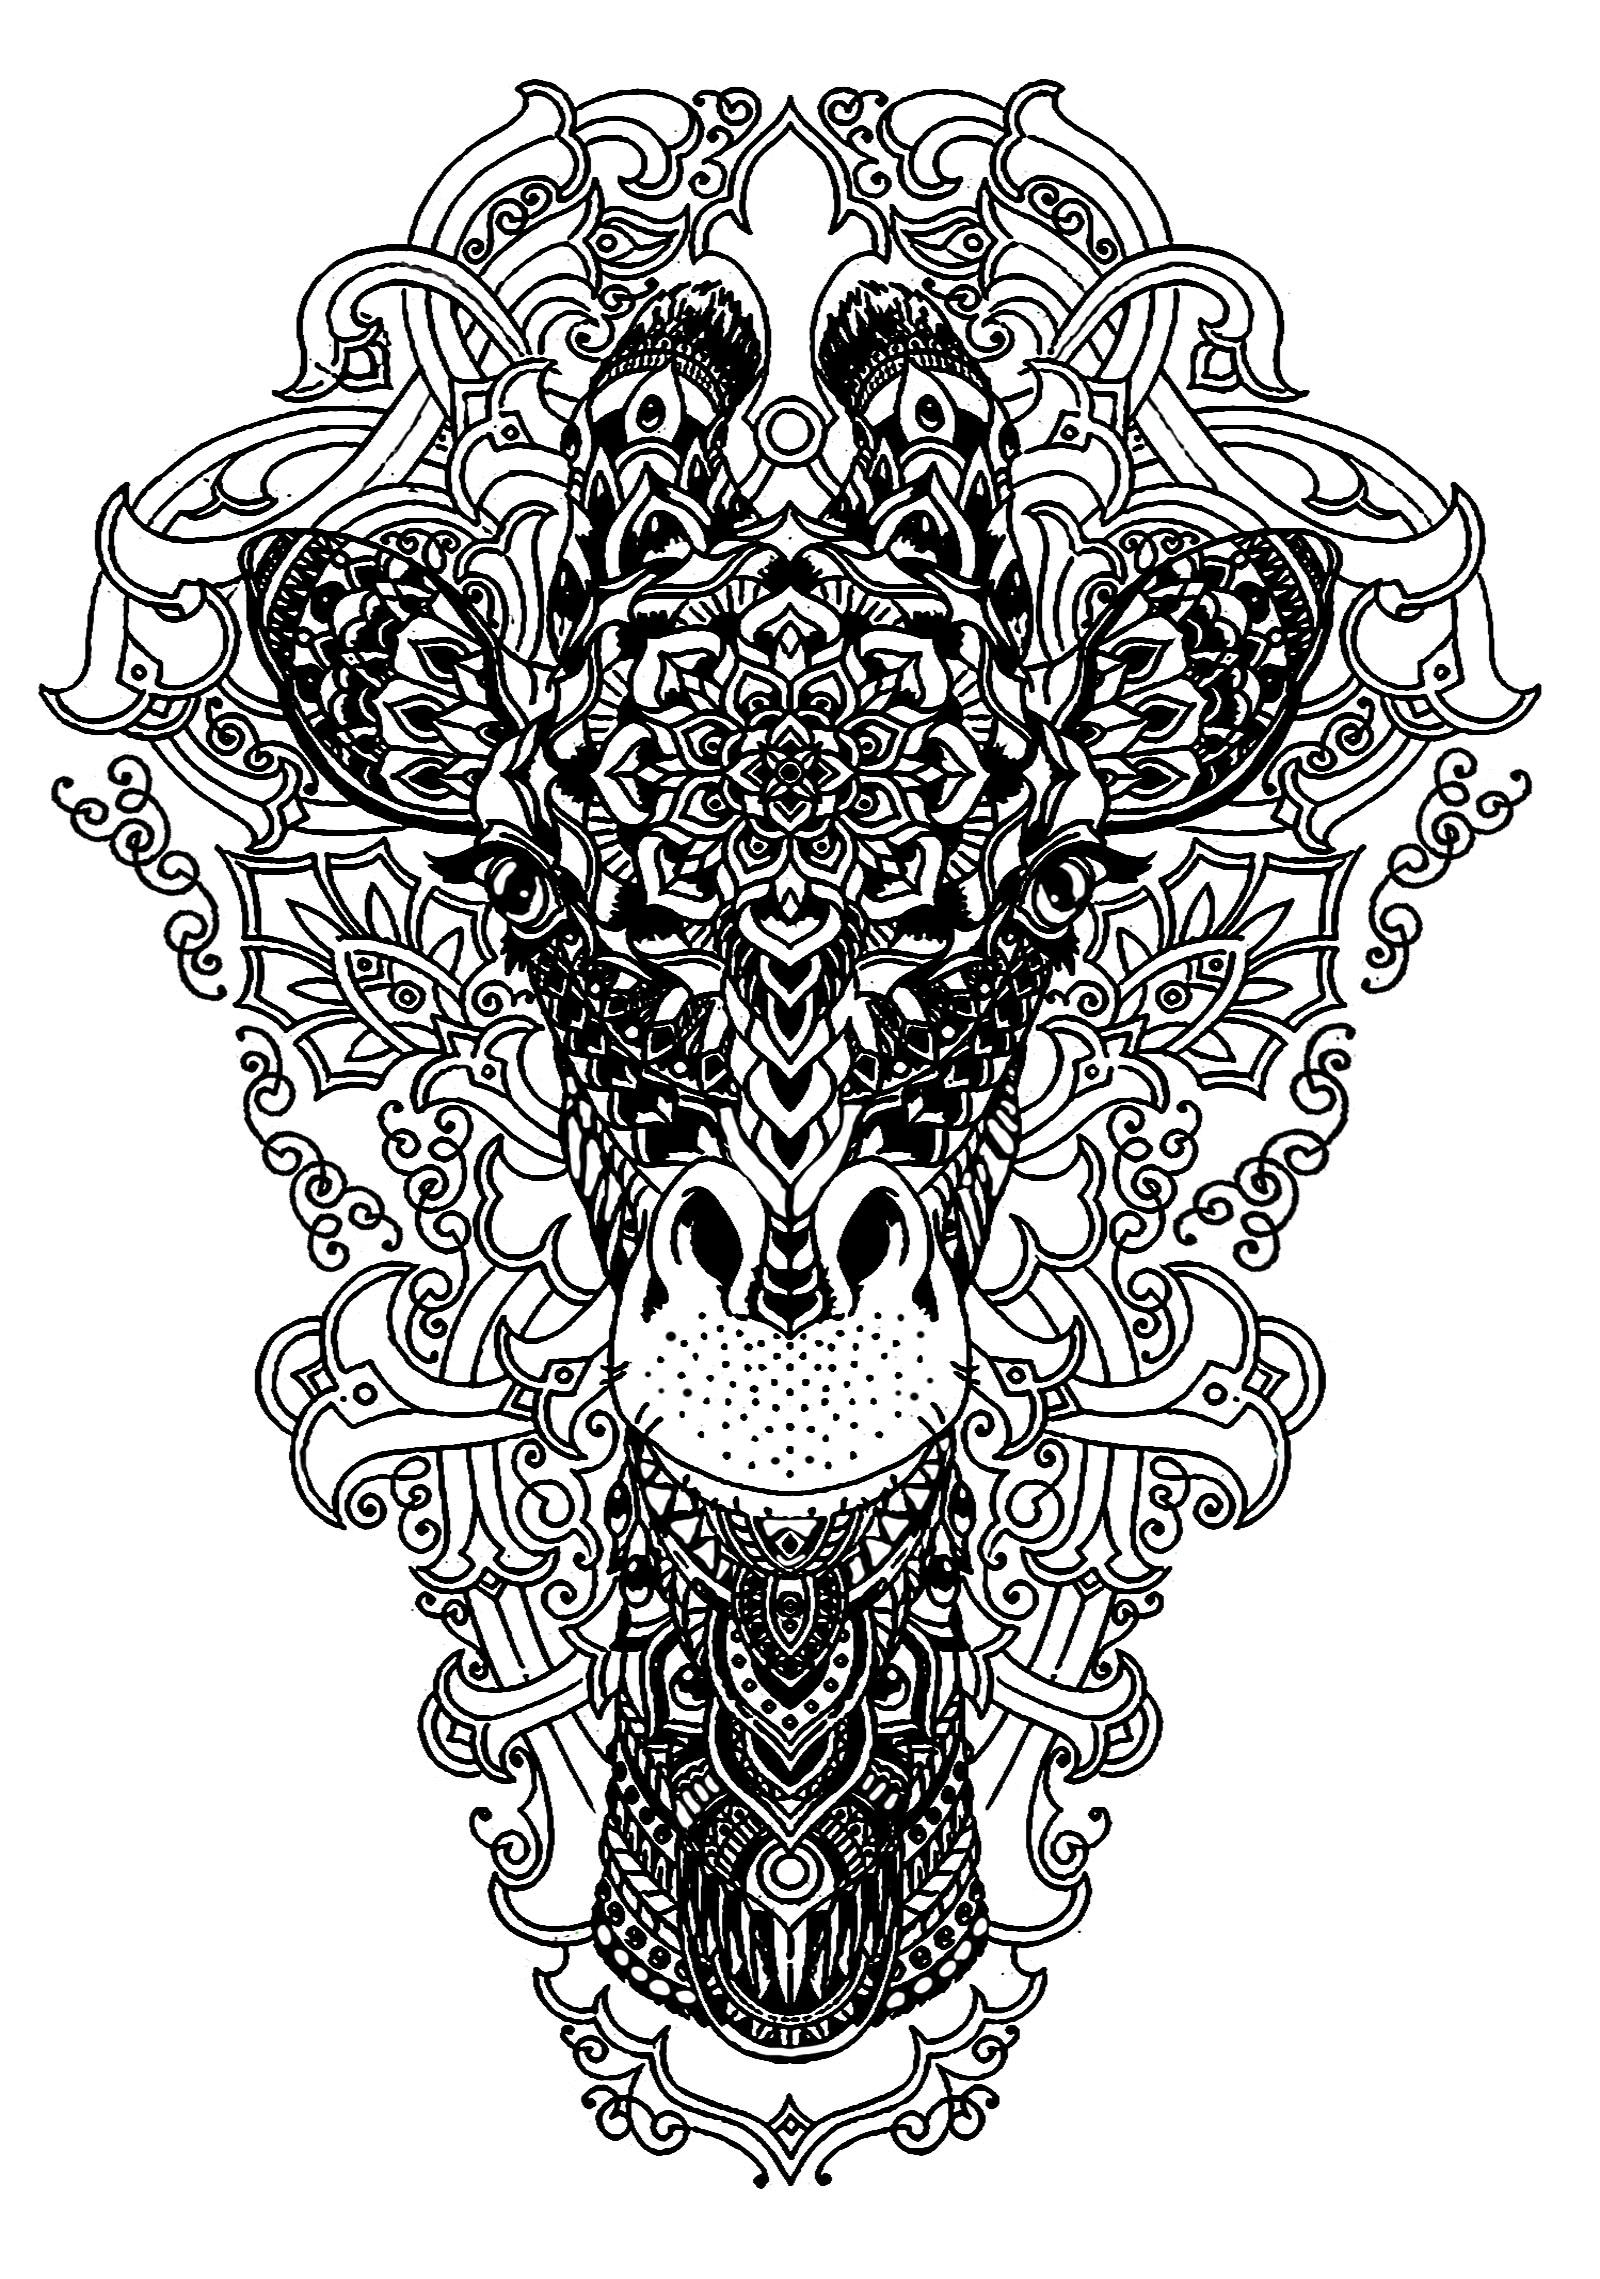 Colorear para adultos  : Jirafas - 2